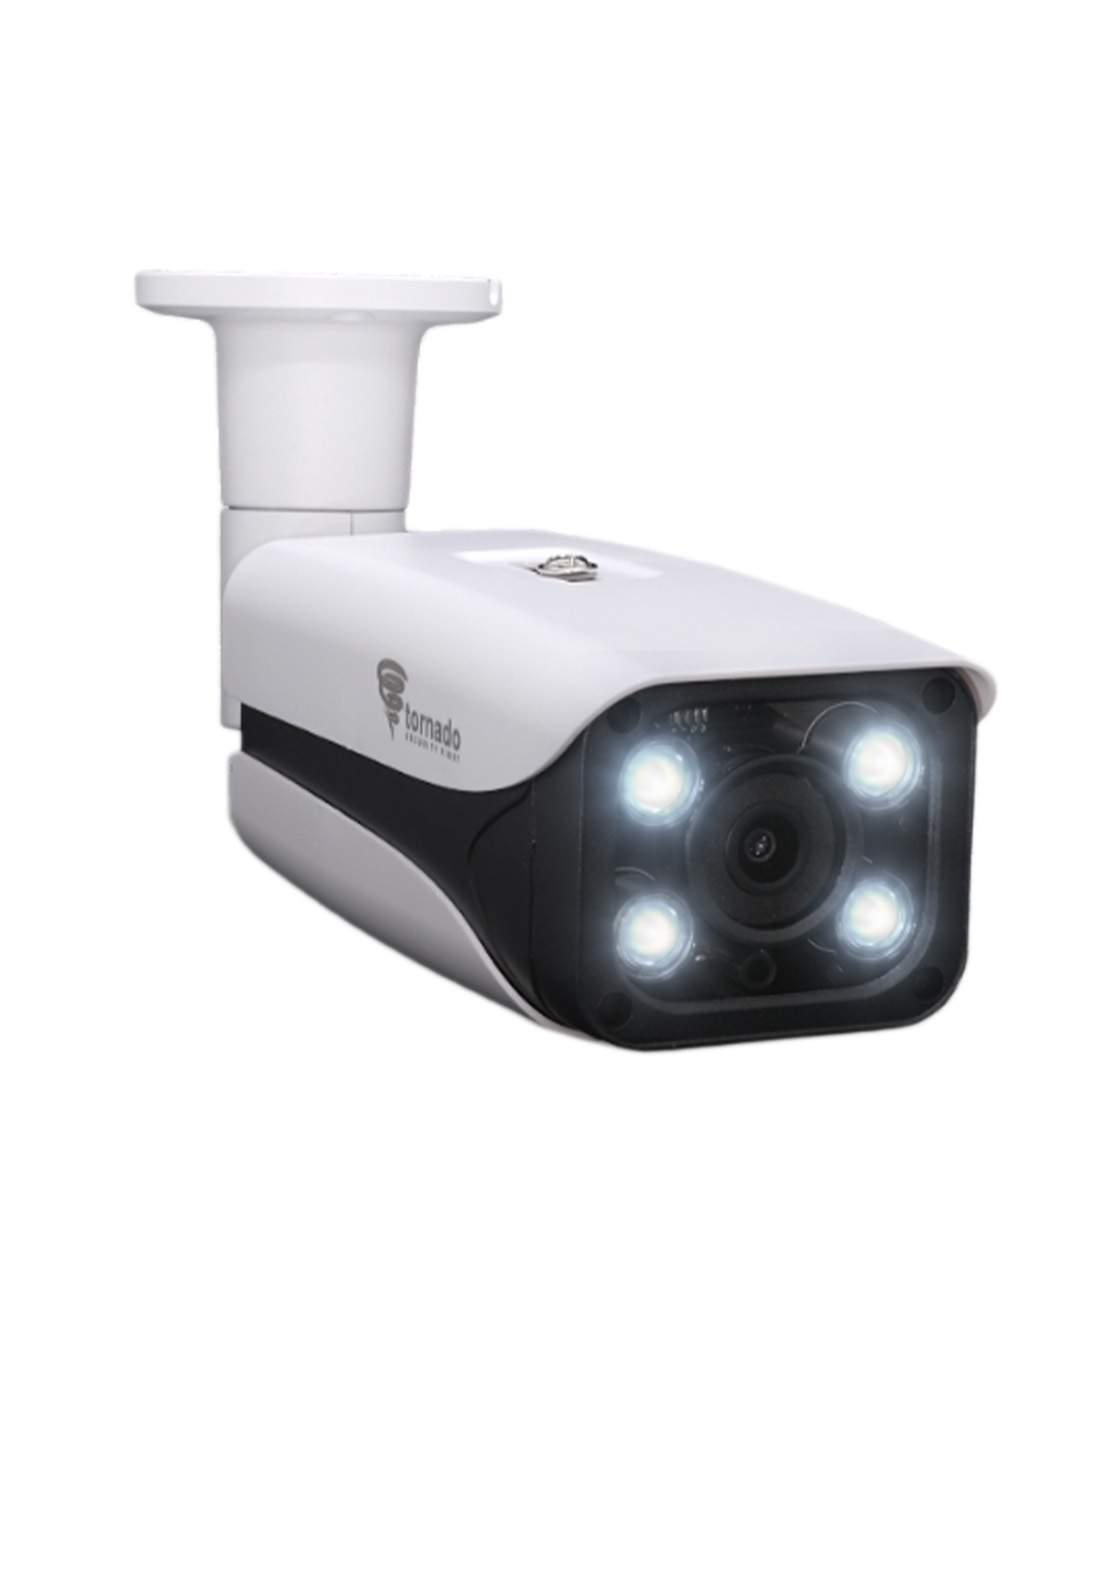 Tornado 5025 AHD 5mp Security Camera - White  كاميرا مراقبة